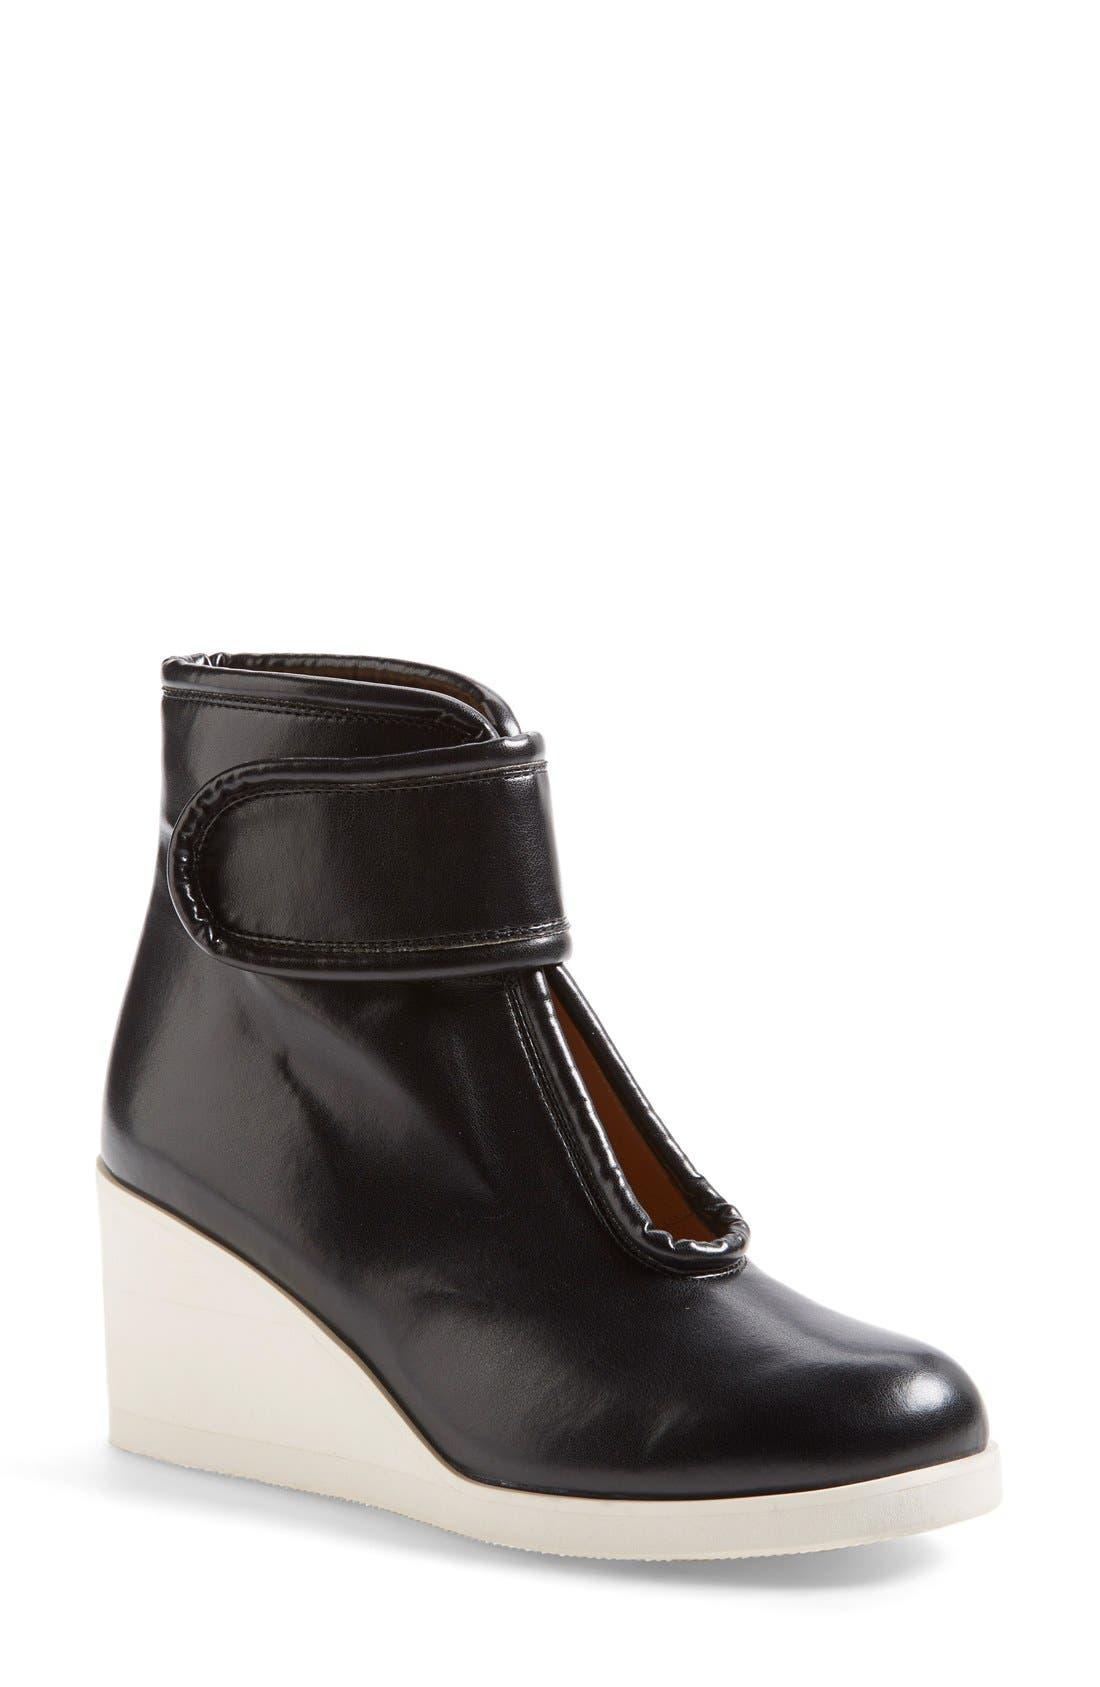 Main Image - MM6 Maison Margiela Nappa Leather Wedge Bootie (Women)